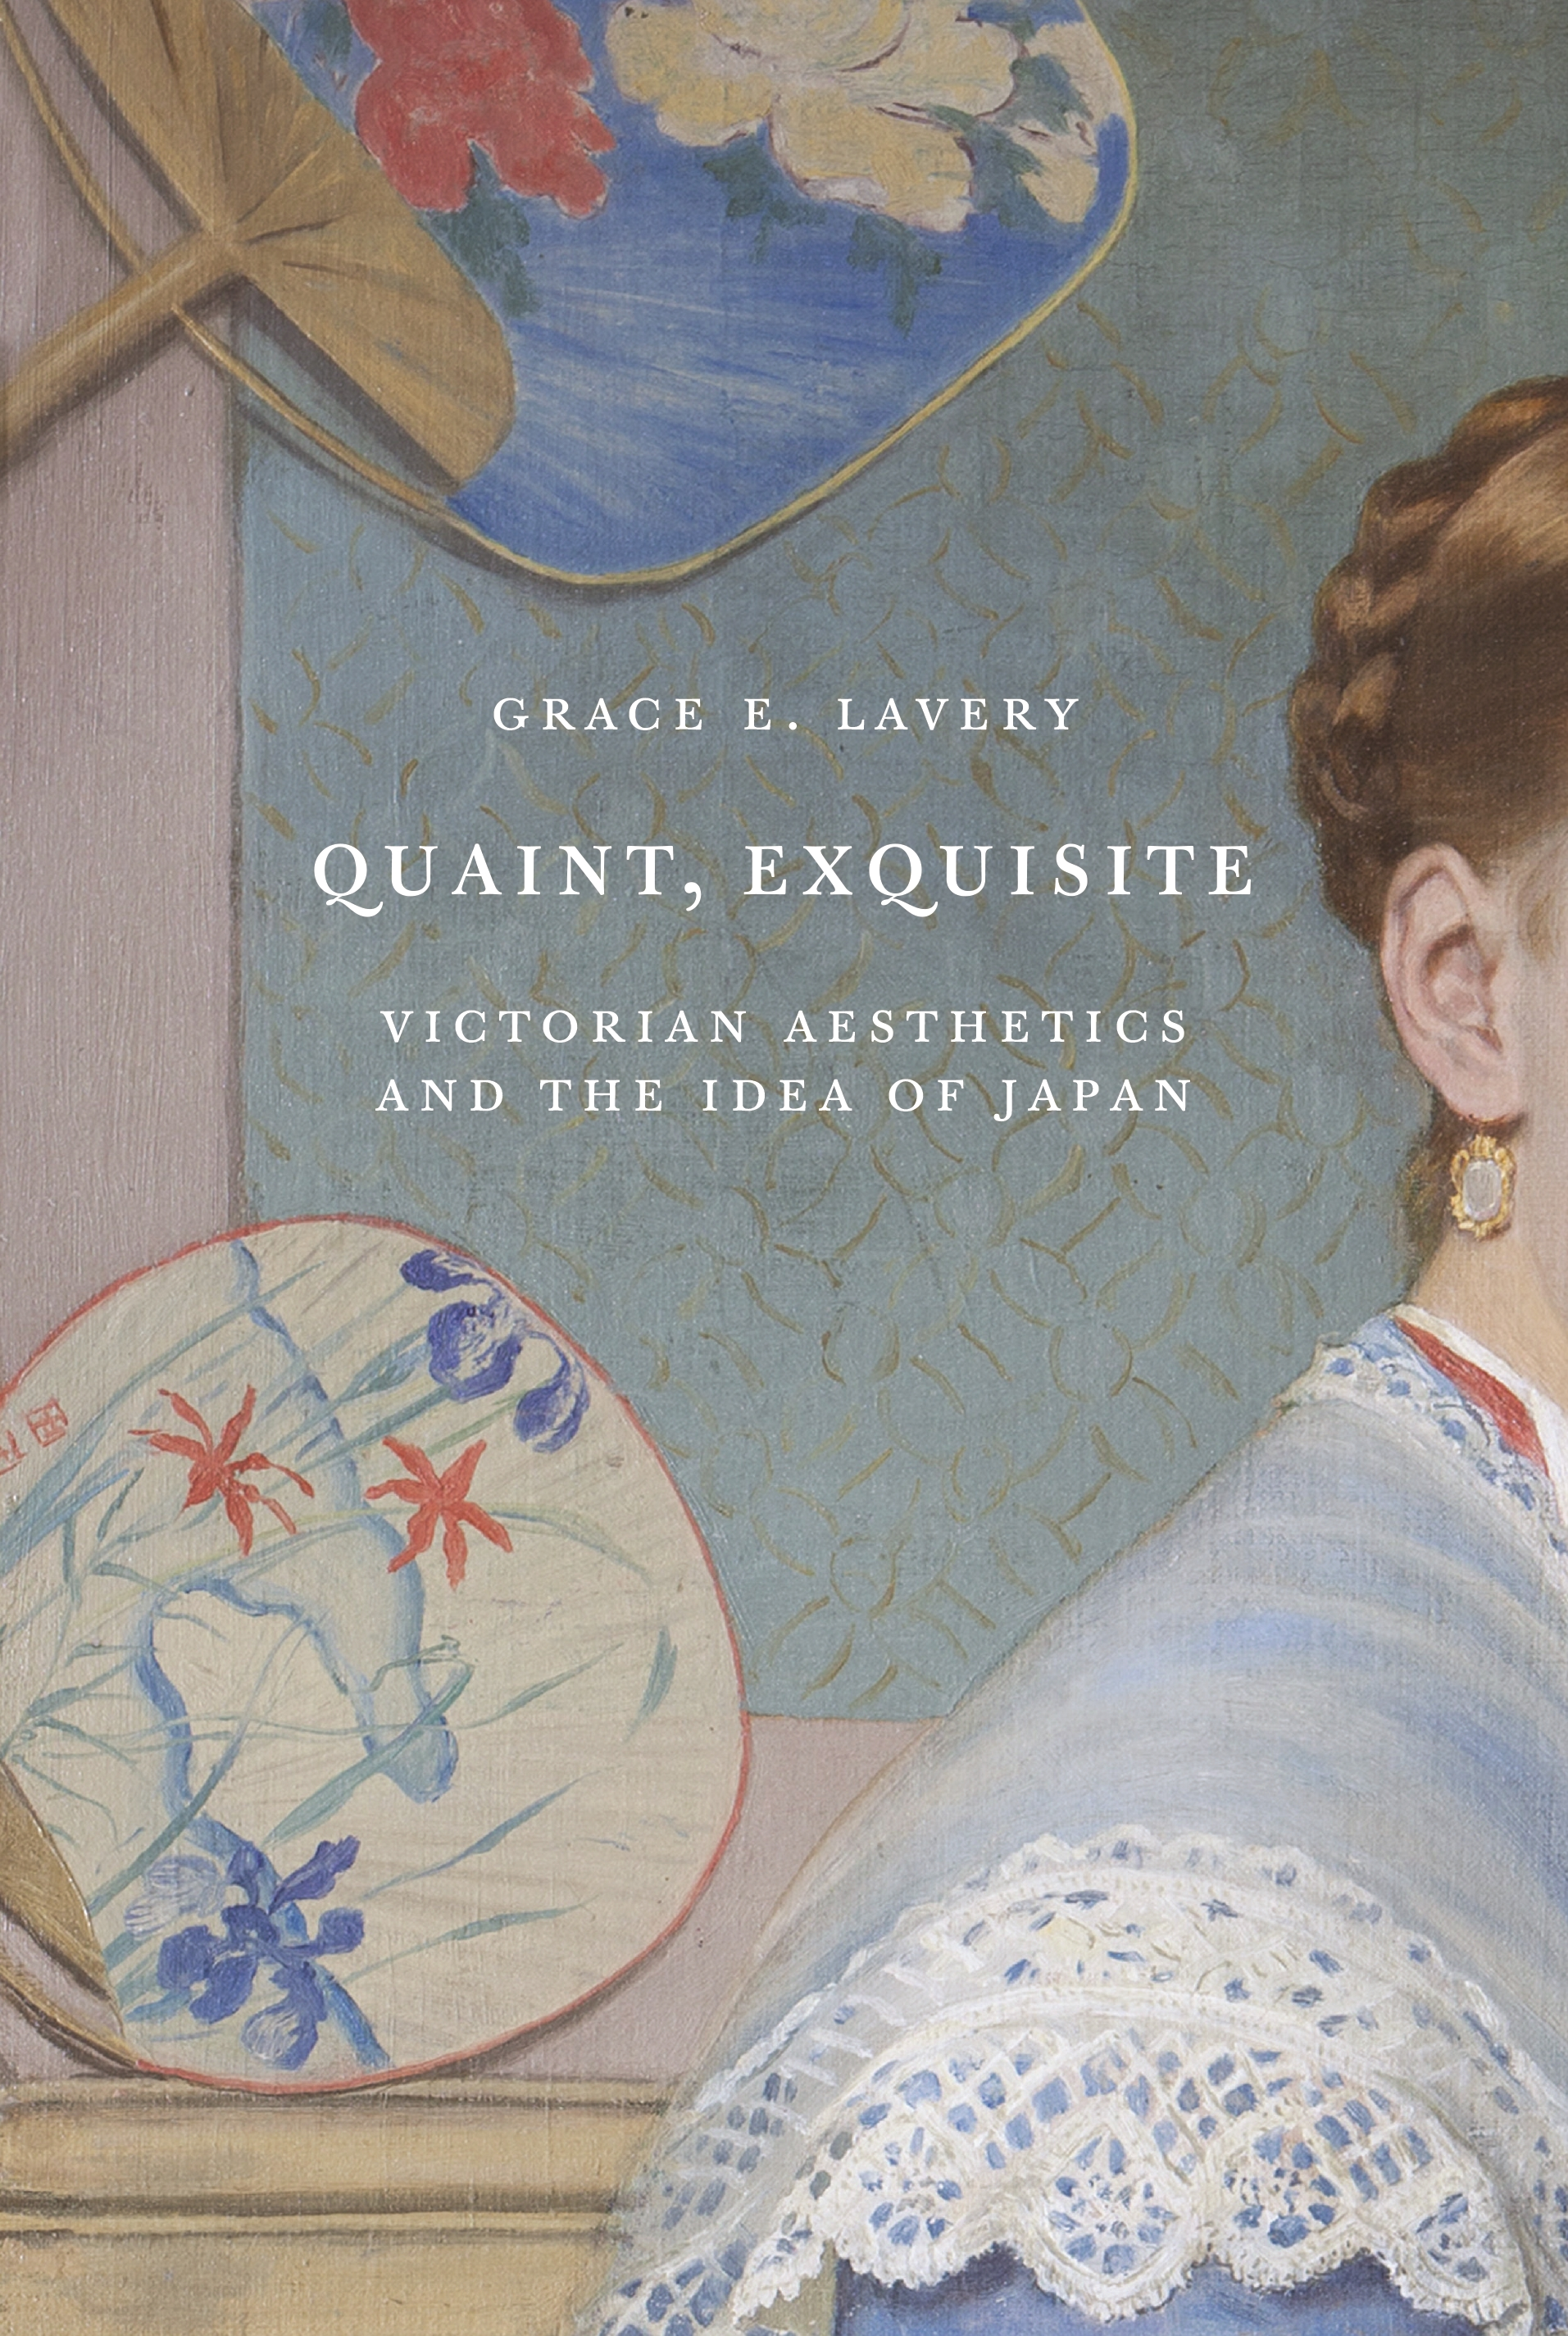 Quaint Exquisite Princeton University Press